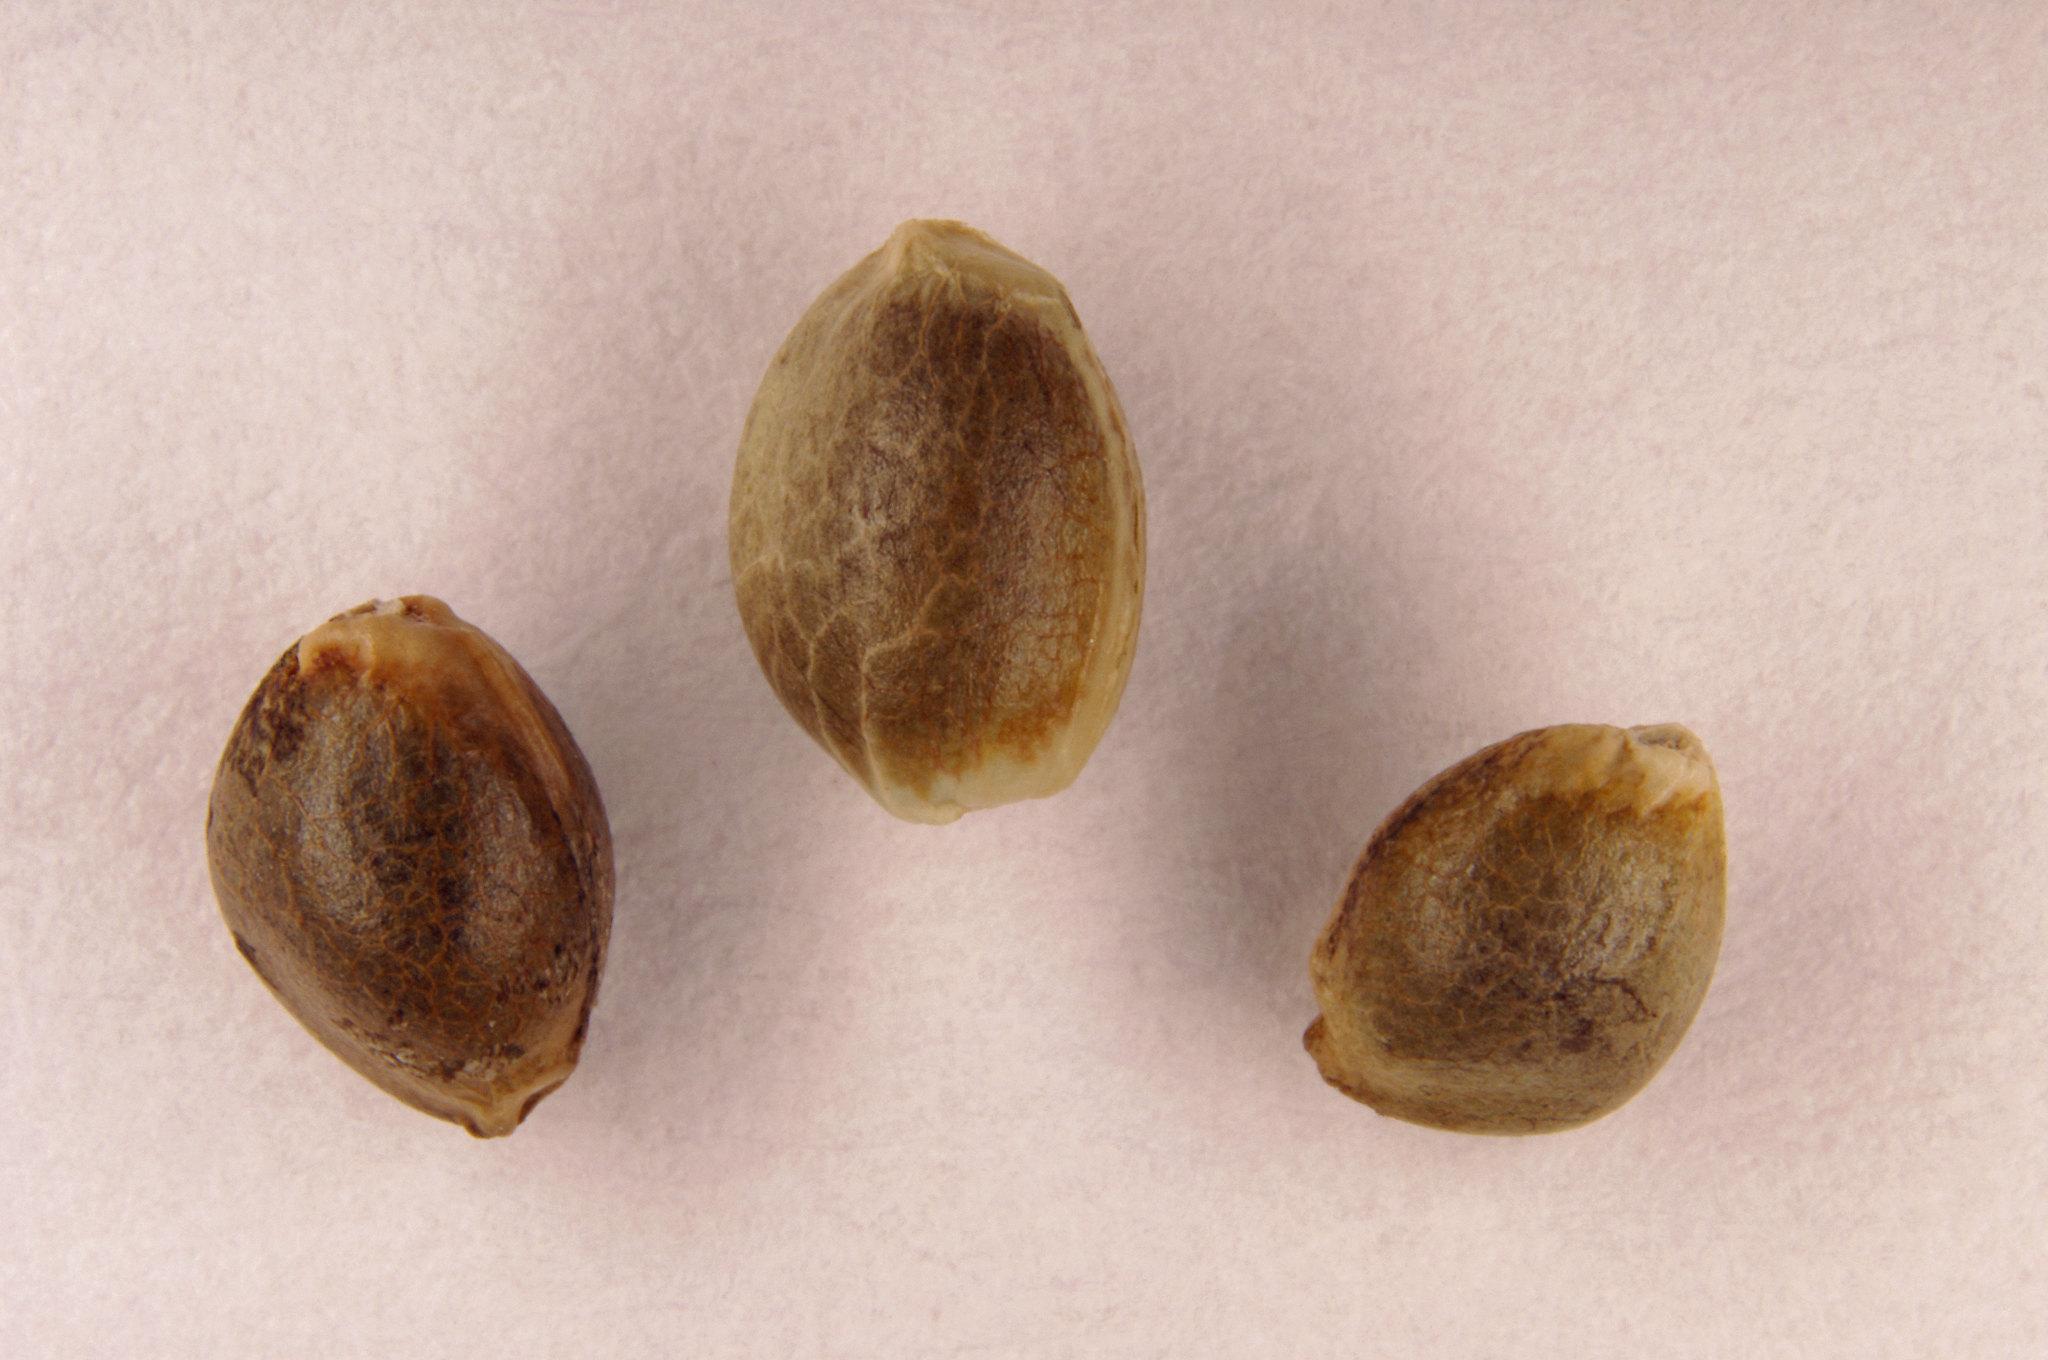 cloning feminized seeds